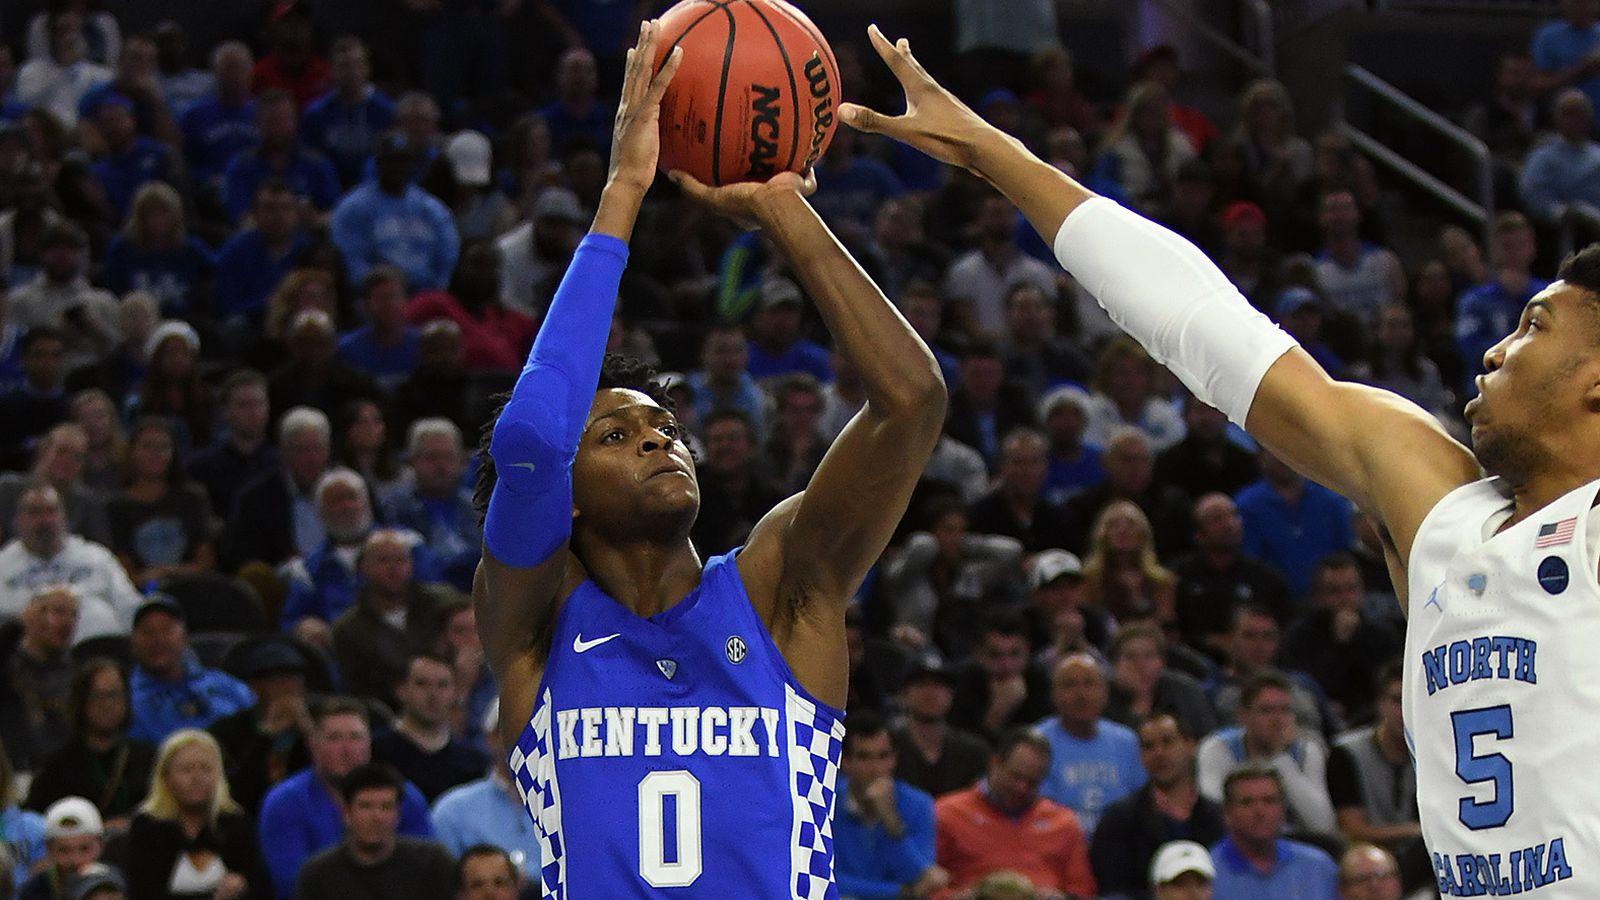 Kentucky Basketball Announces Tv Schedule Game Times And: Kentucky Wildcats Vs North Carolina Tar Heels Game Time